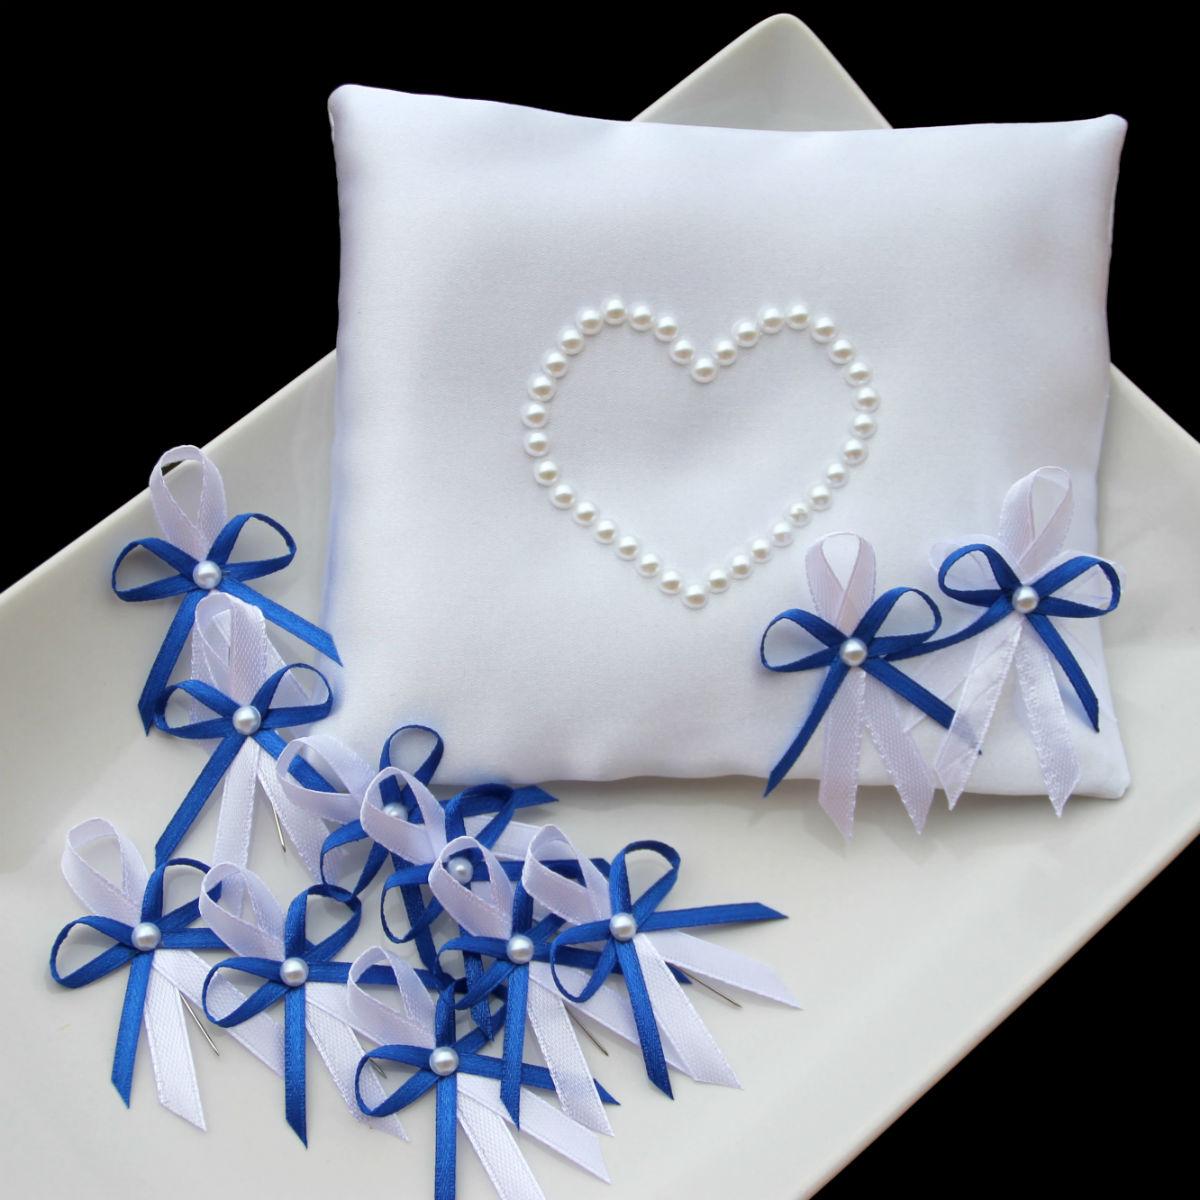 Svatba Kralovsky Modra Polstarek Vyvazky Zakladni Sada 1 6 10